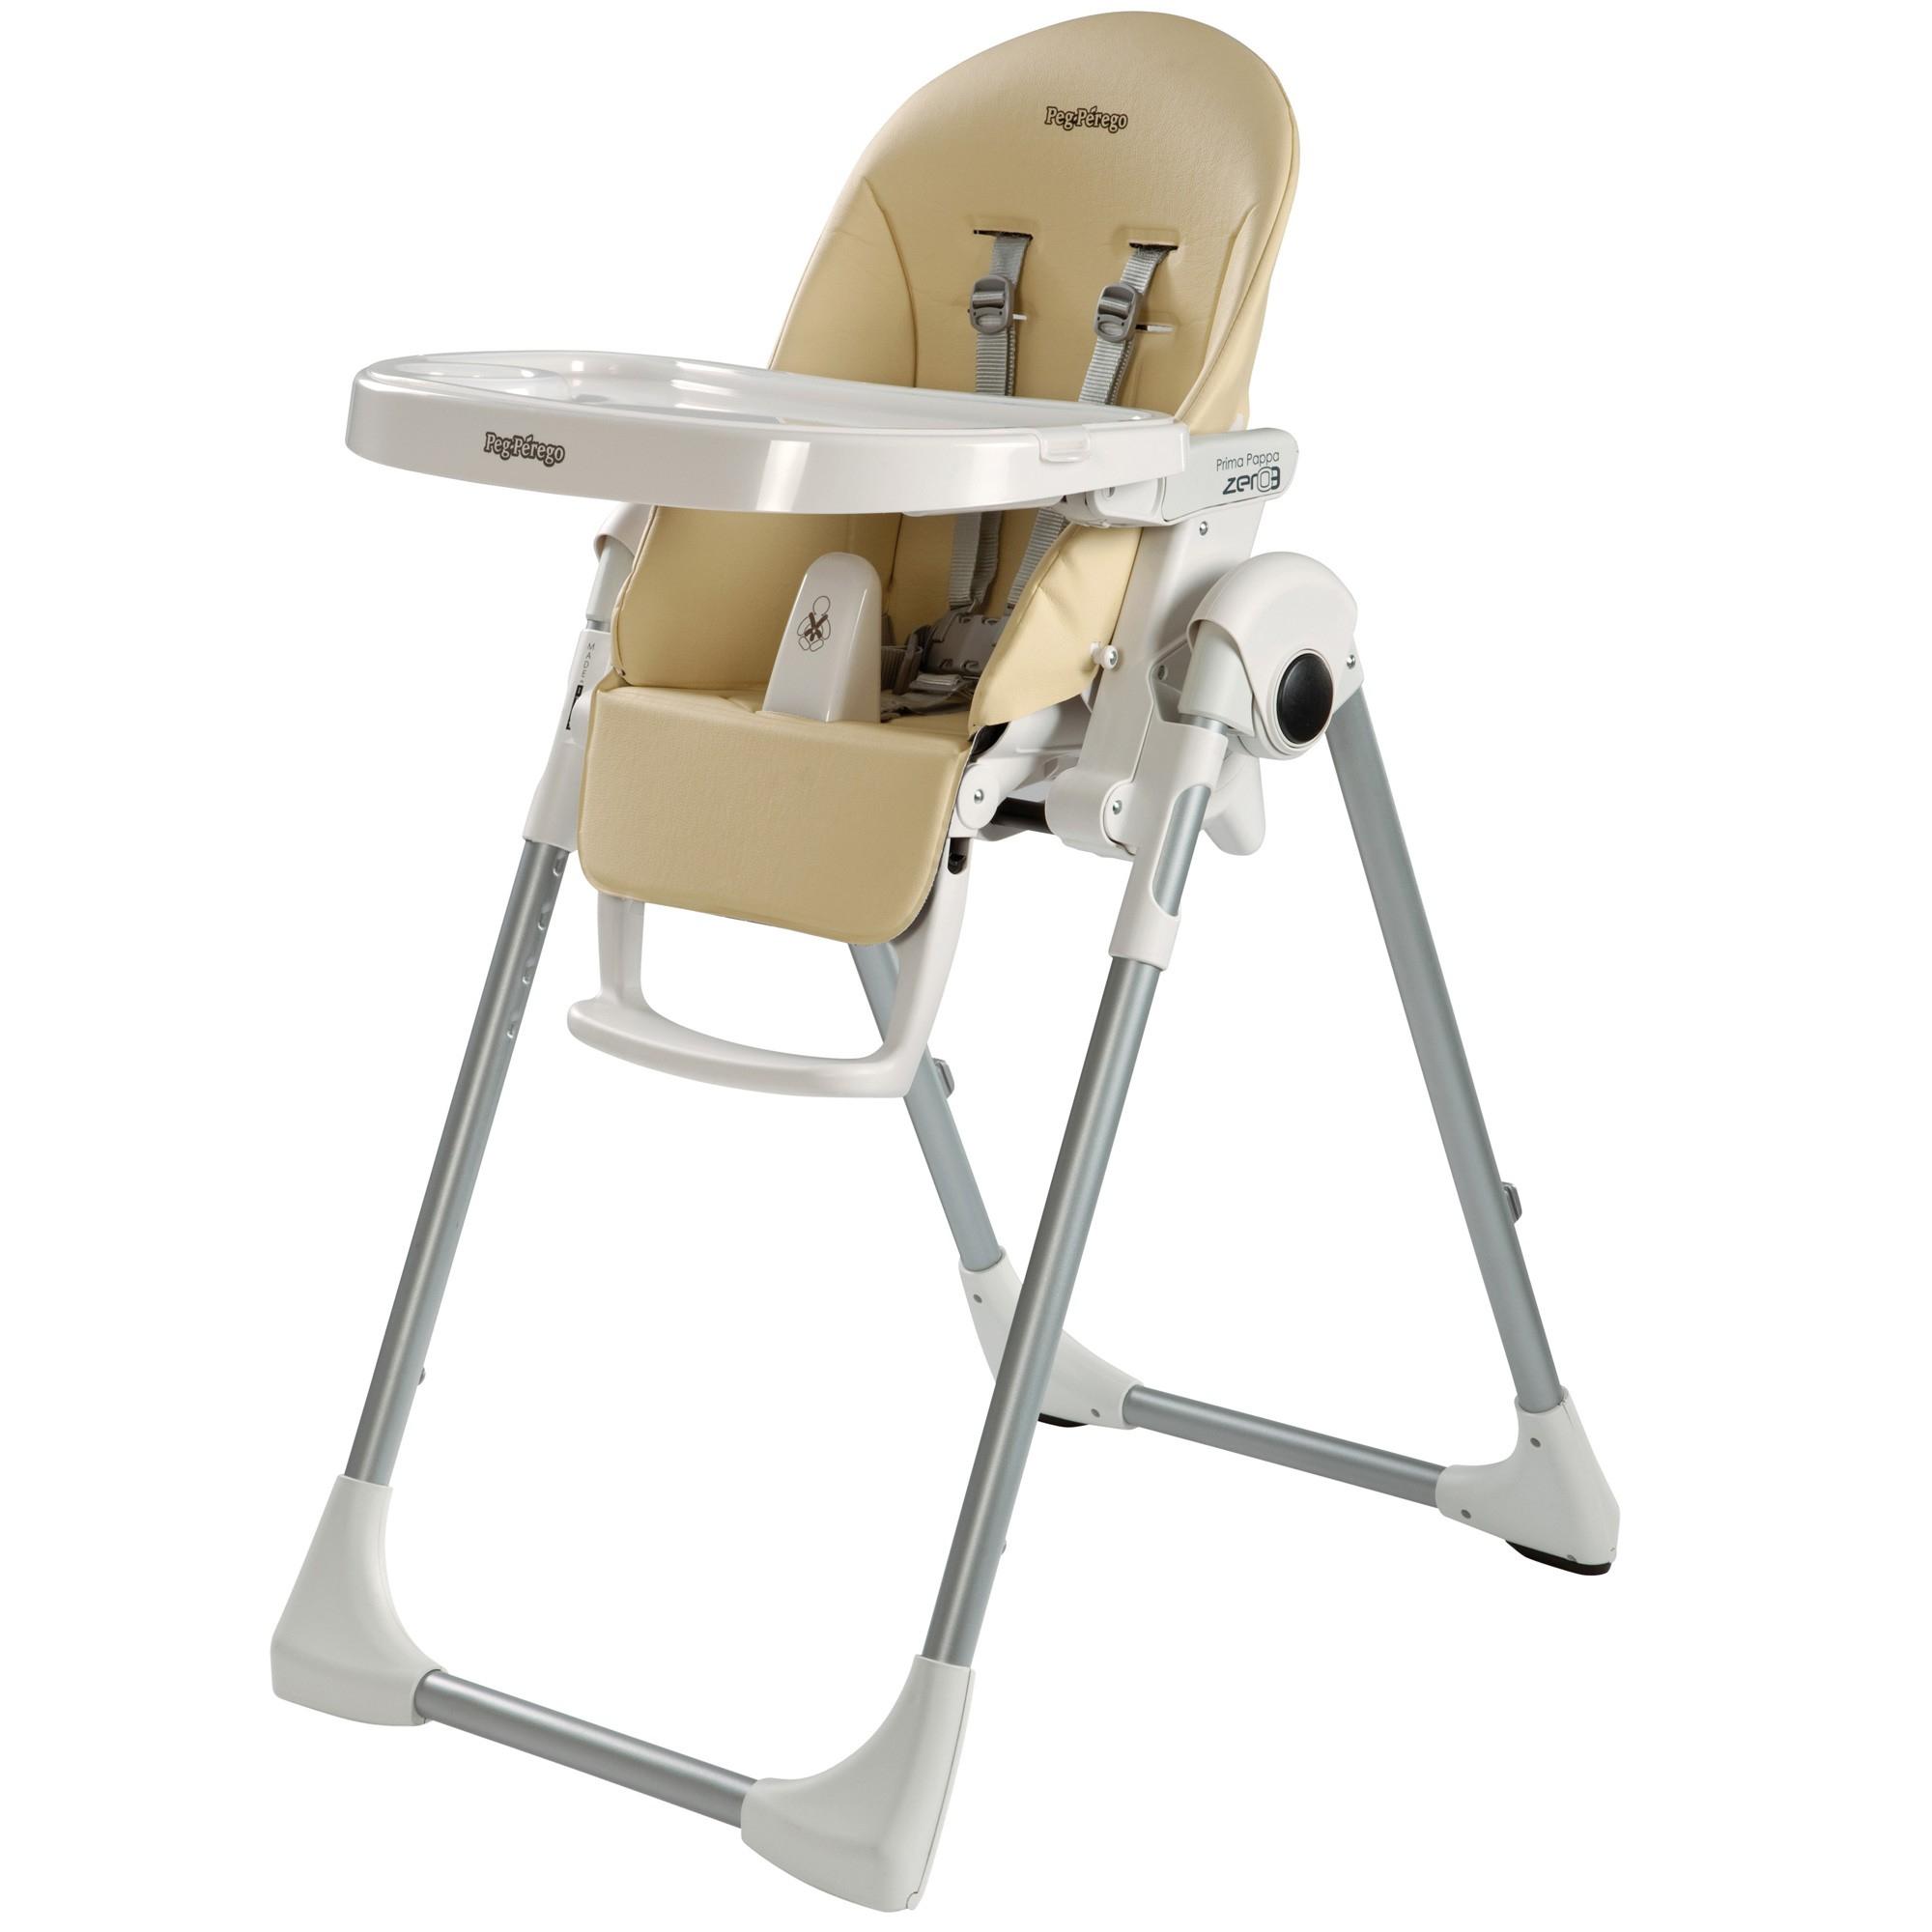 chaise haute peg perego zero 3